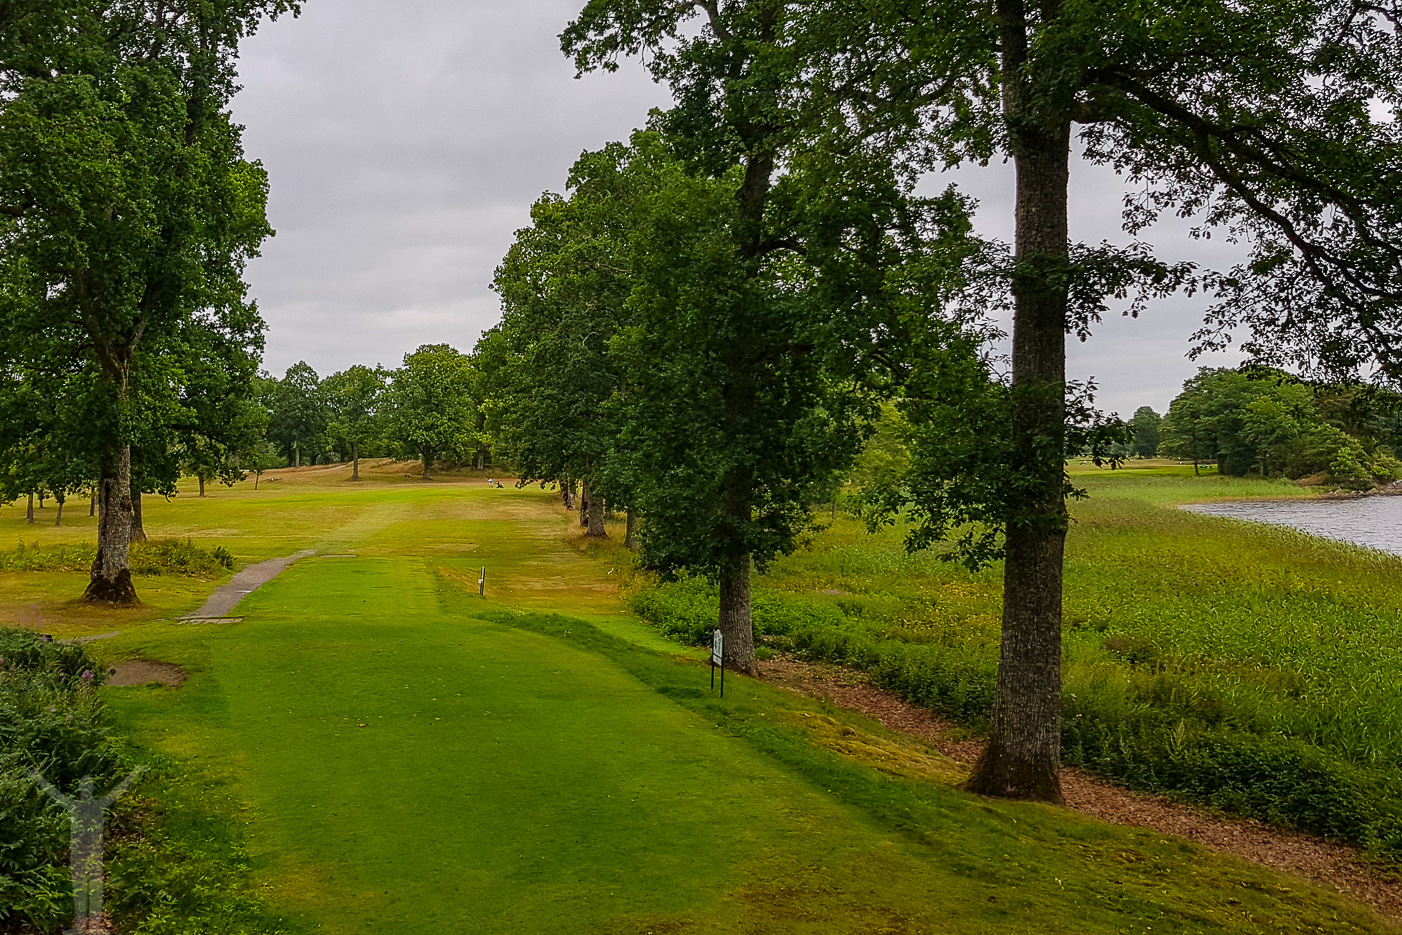 Golf på Koberg - tee på hål 4